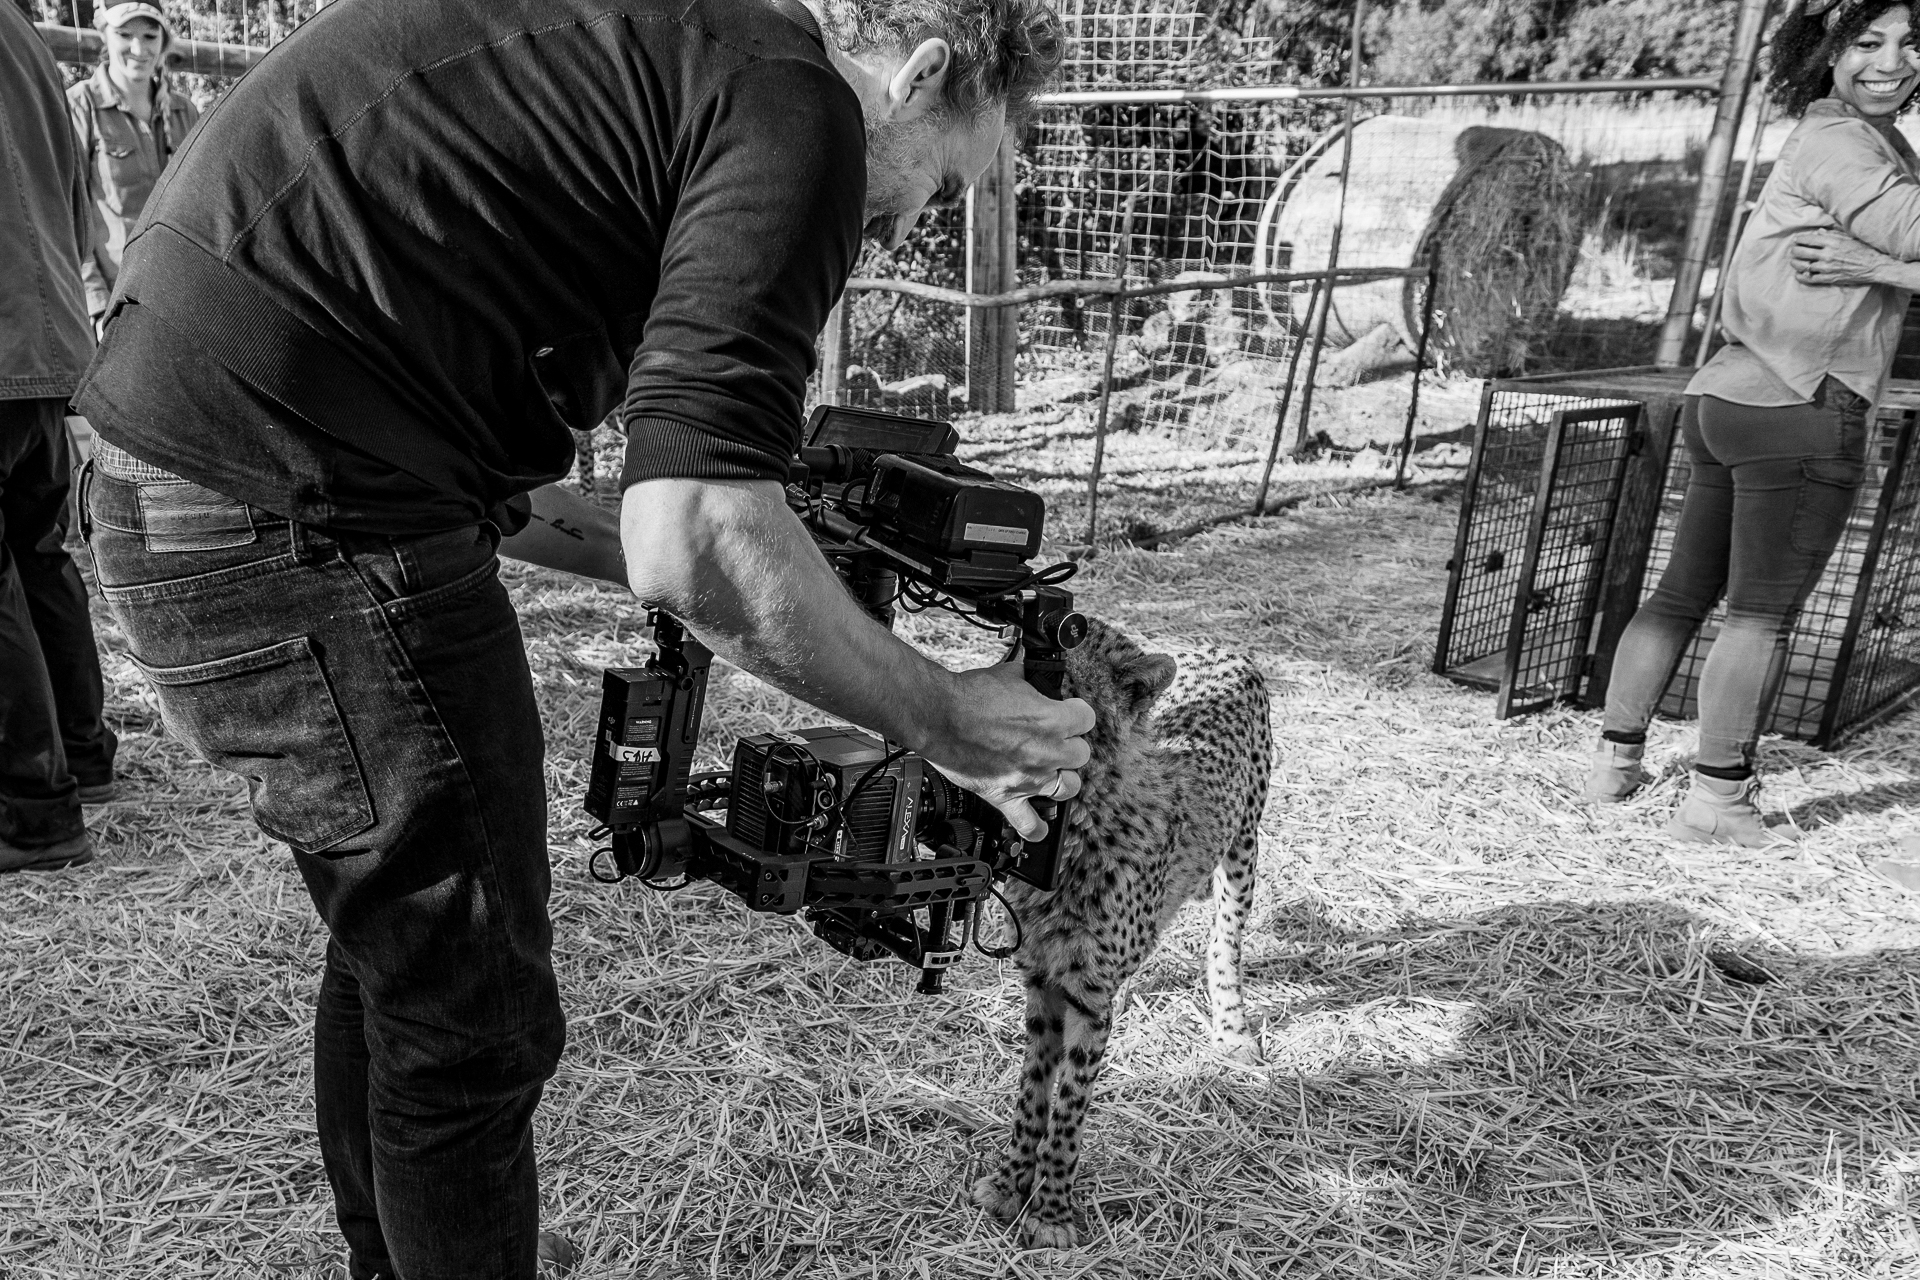 Shoot Day 14 of 19; Sc 3/28; Ext. day 6; Farm House - Enclosure: BTS, Dennis Pauls.